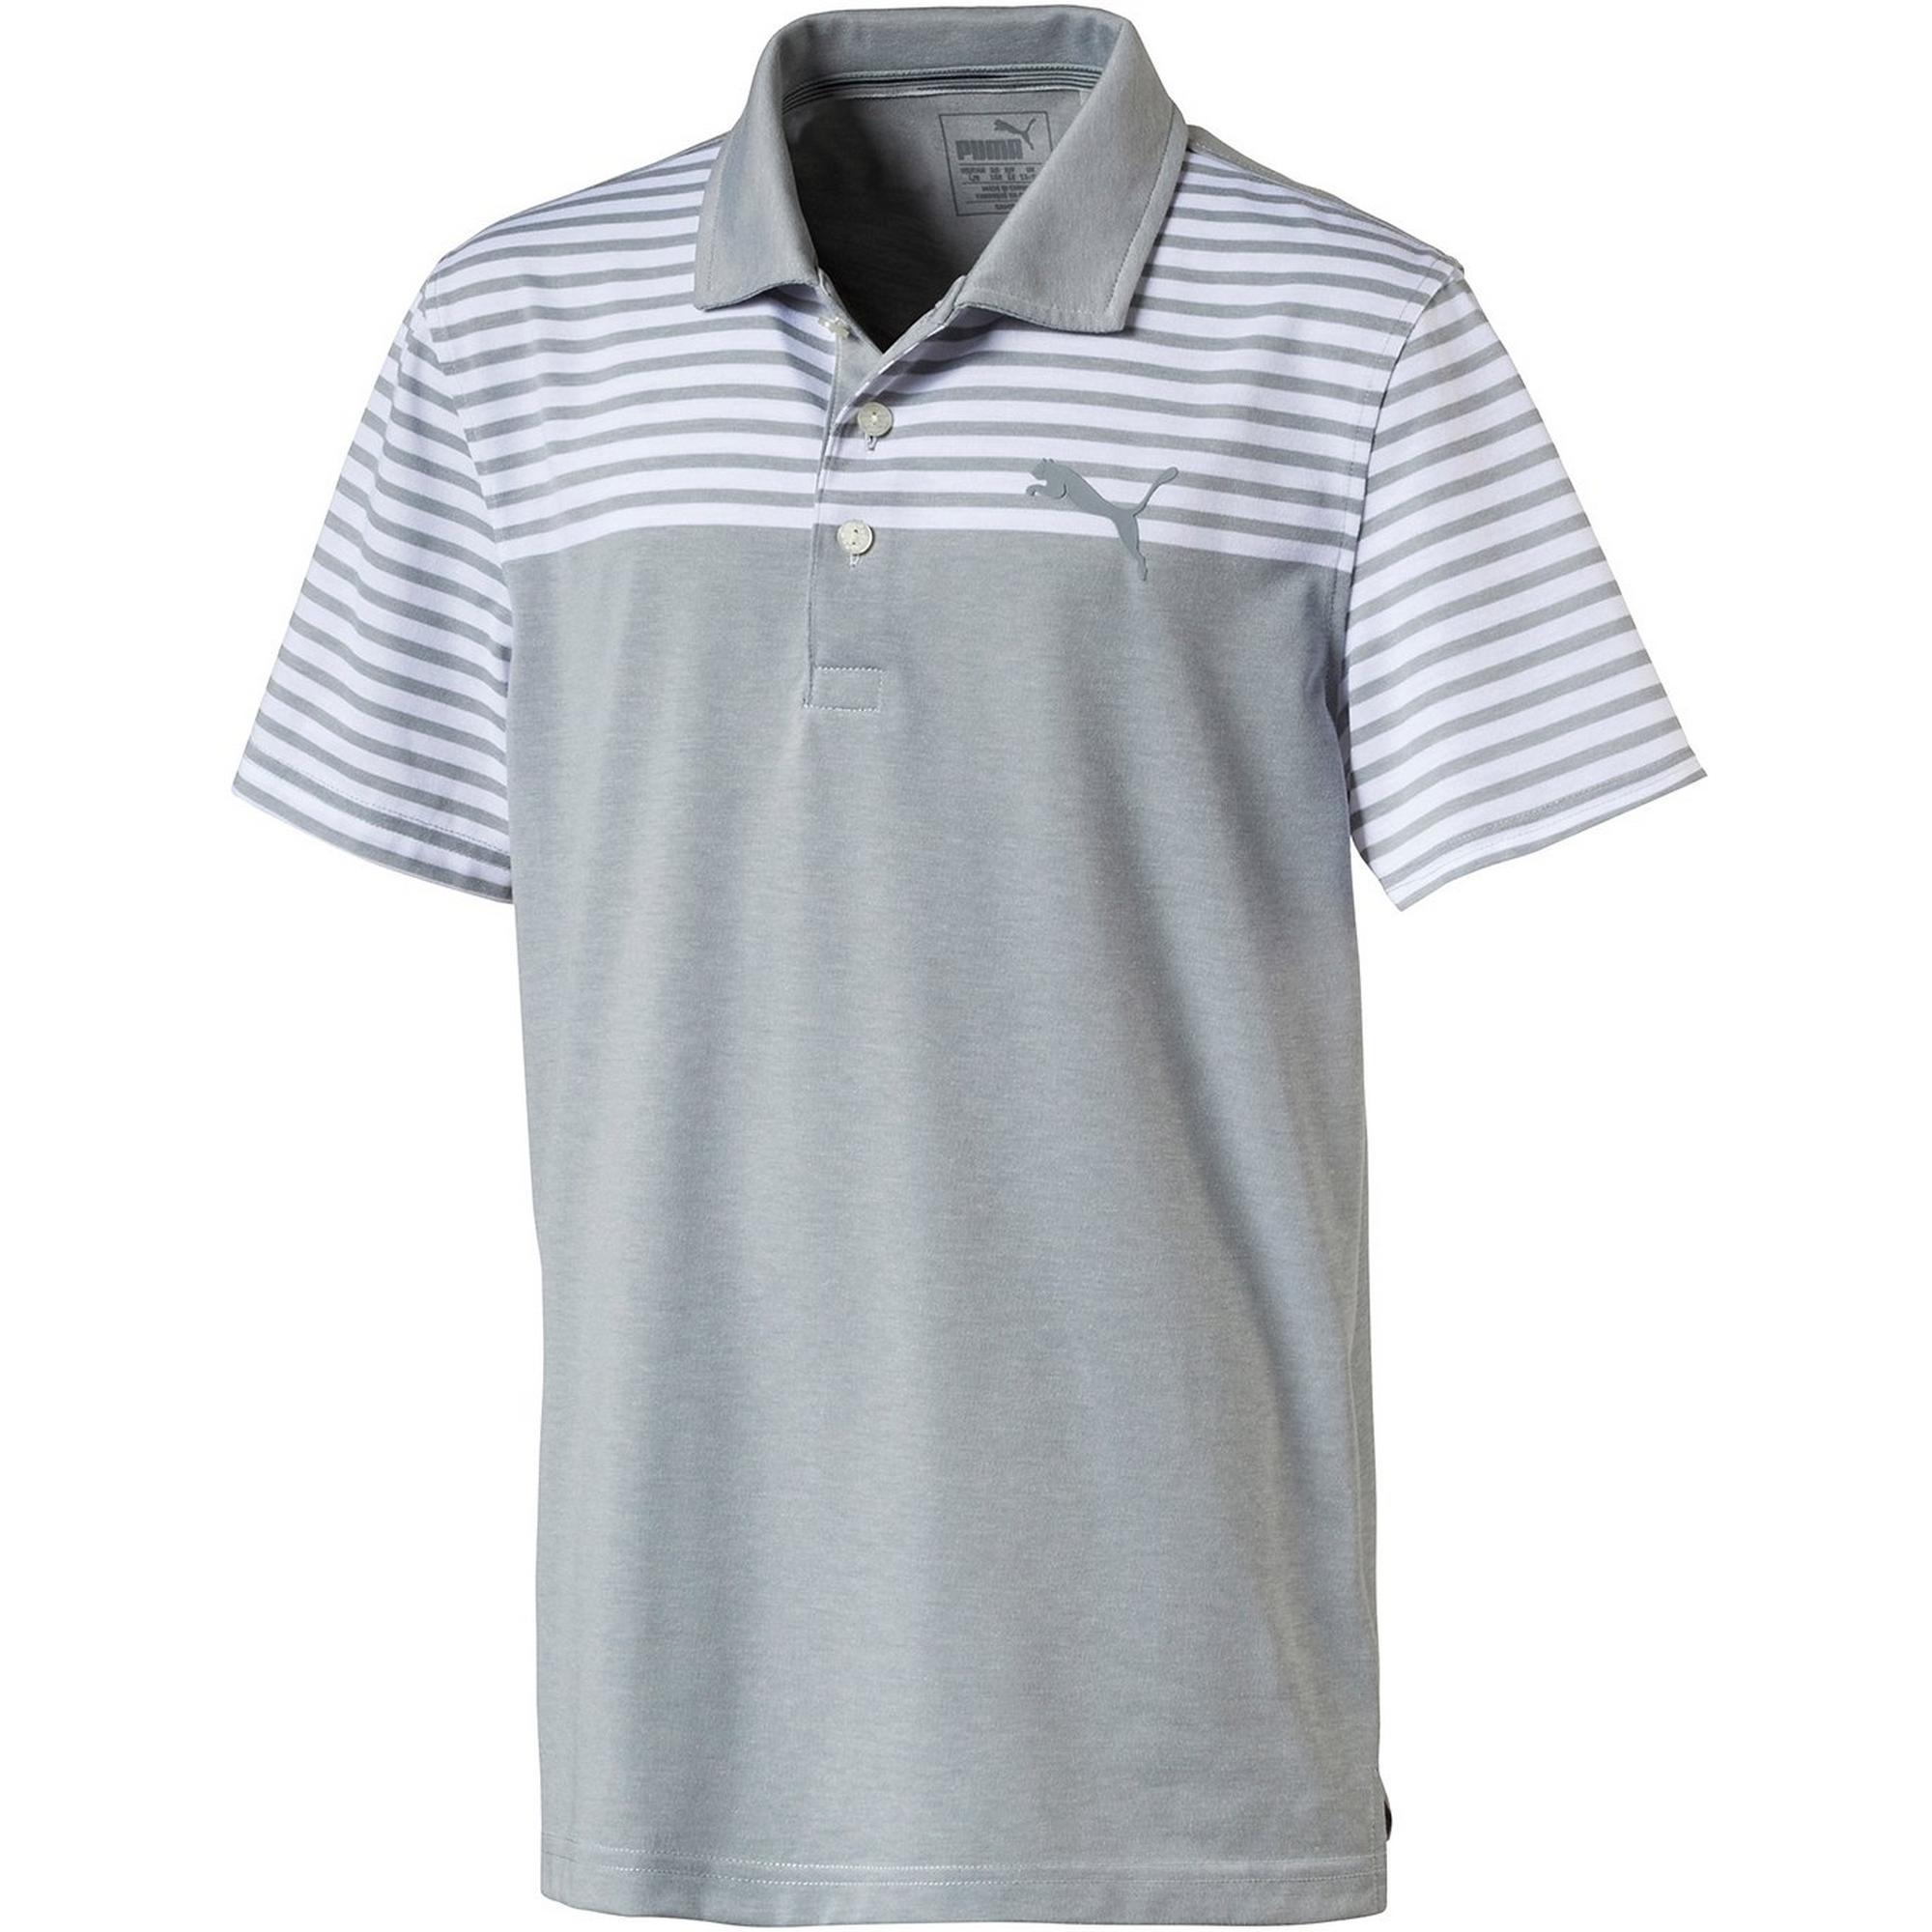 Boy's Clubhouse Short Sleeve Polo